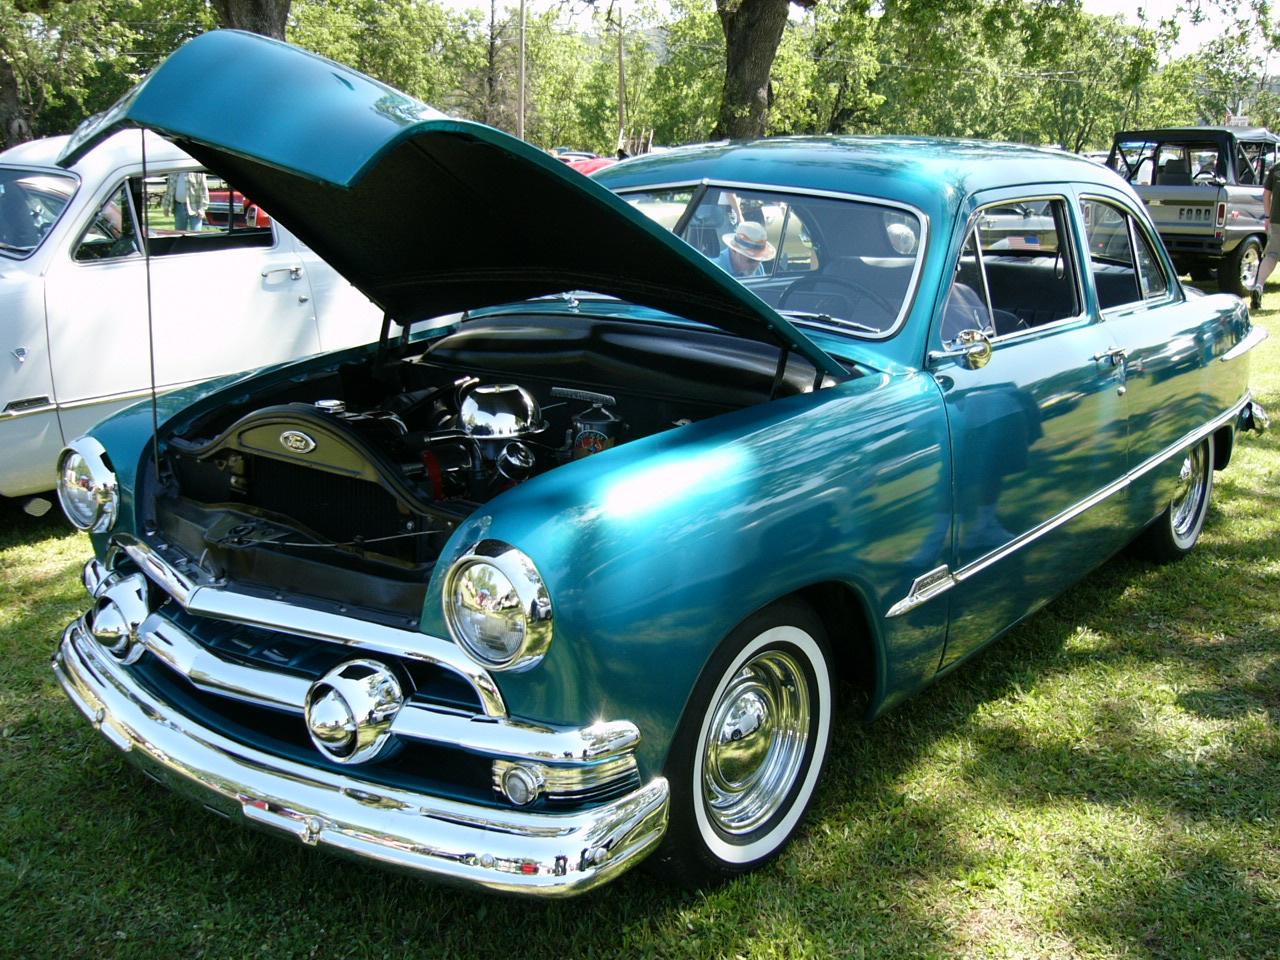 '51 Ford Custom 2 door sedan by RoadTripDog